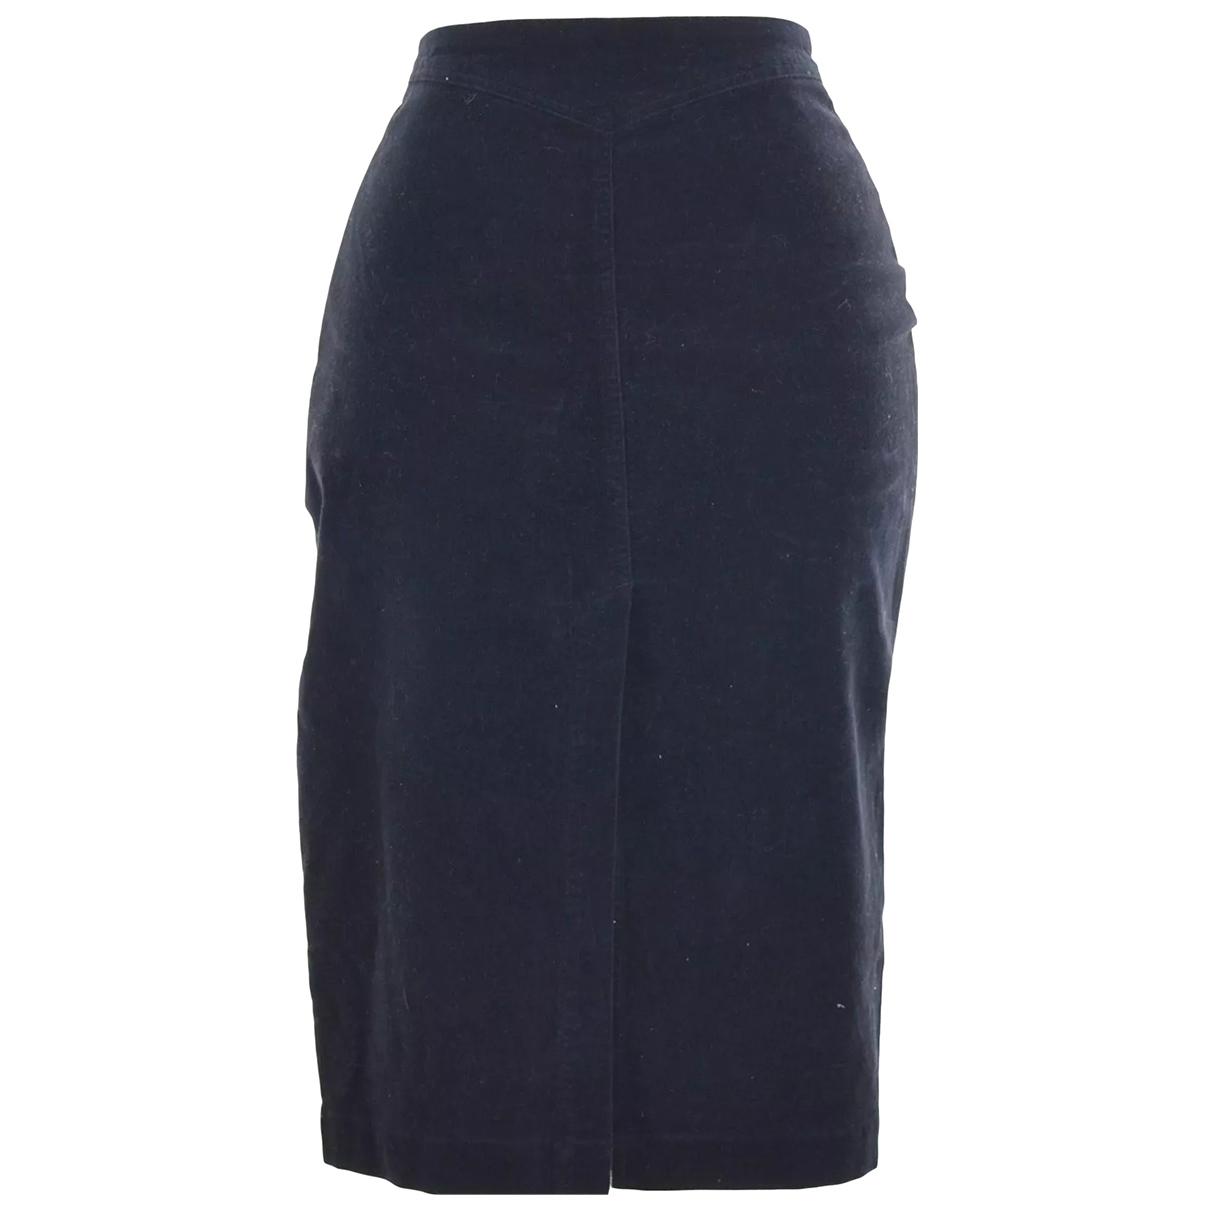 Armani Jeans \N Black Cotton - elasthane skirt for Women 44 IT